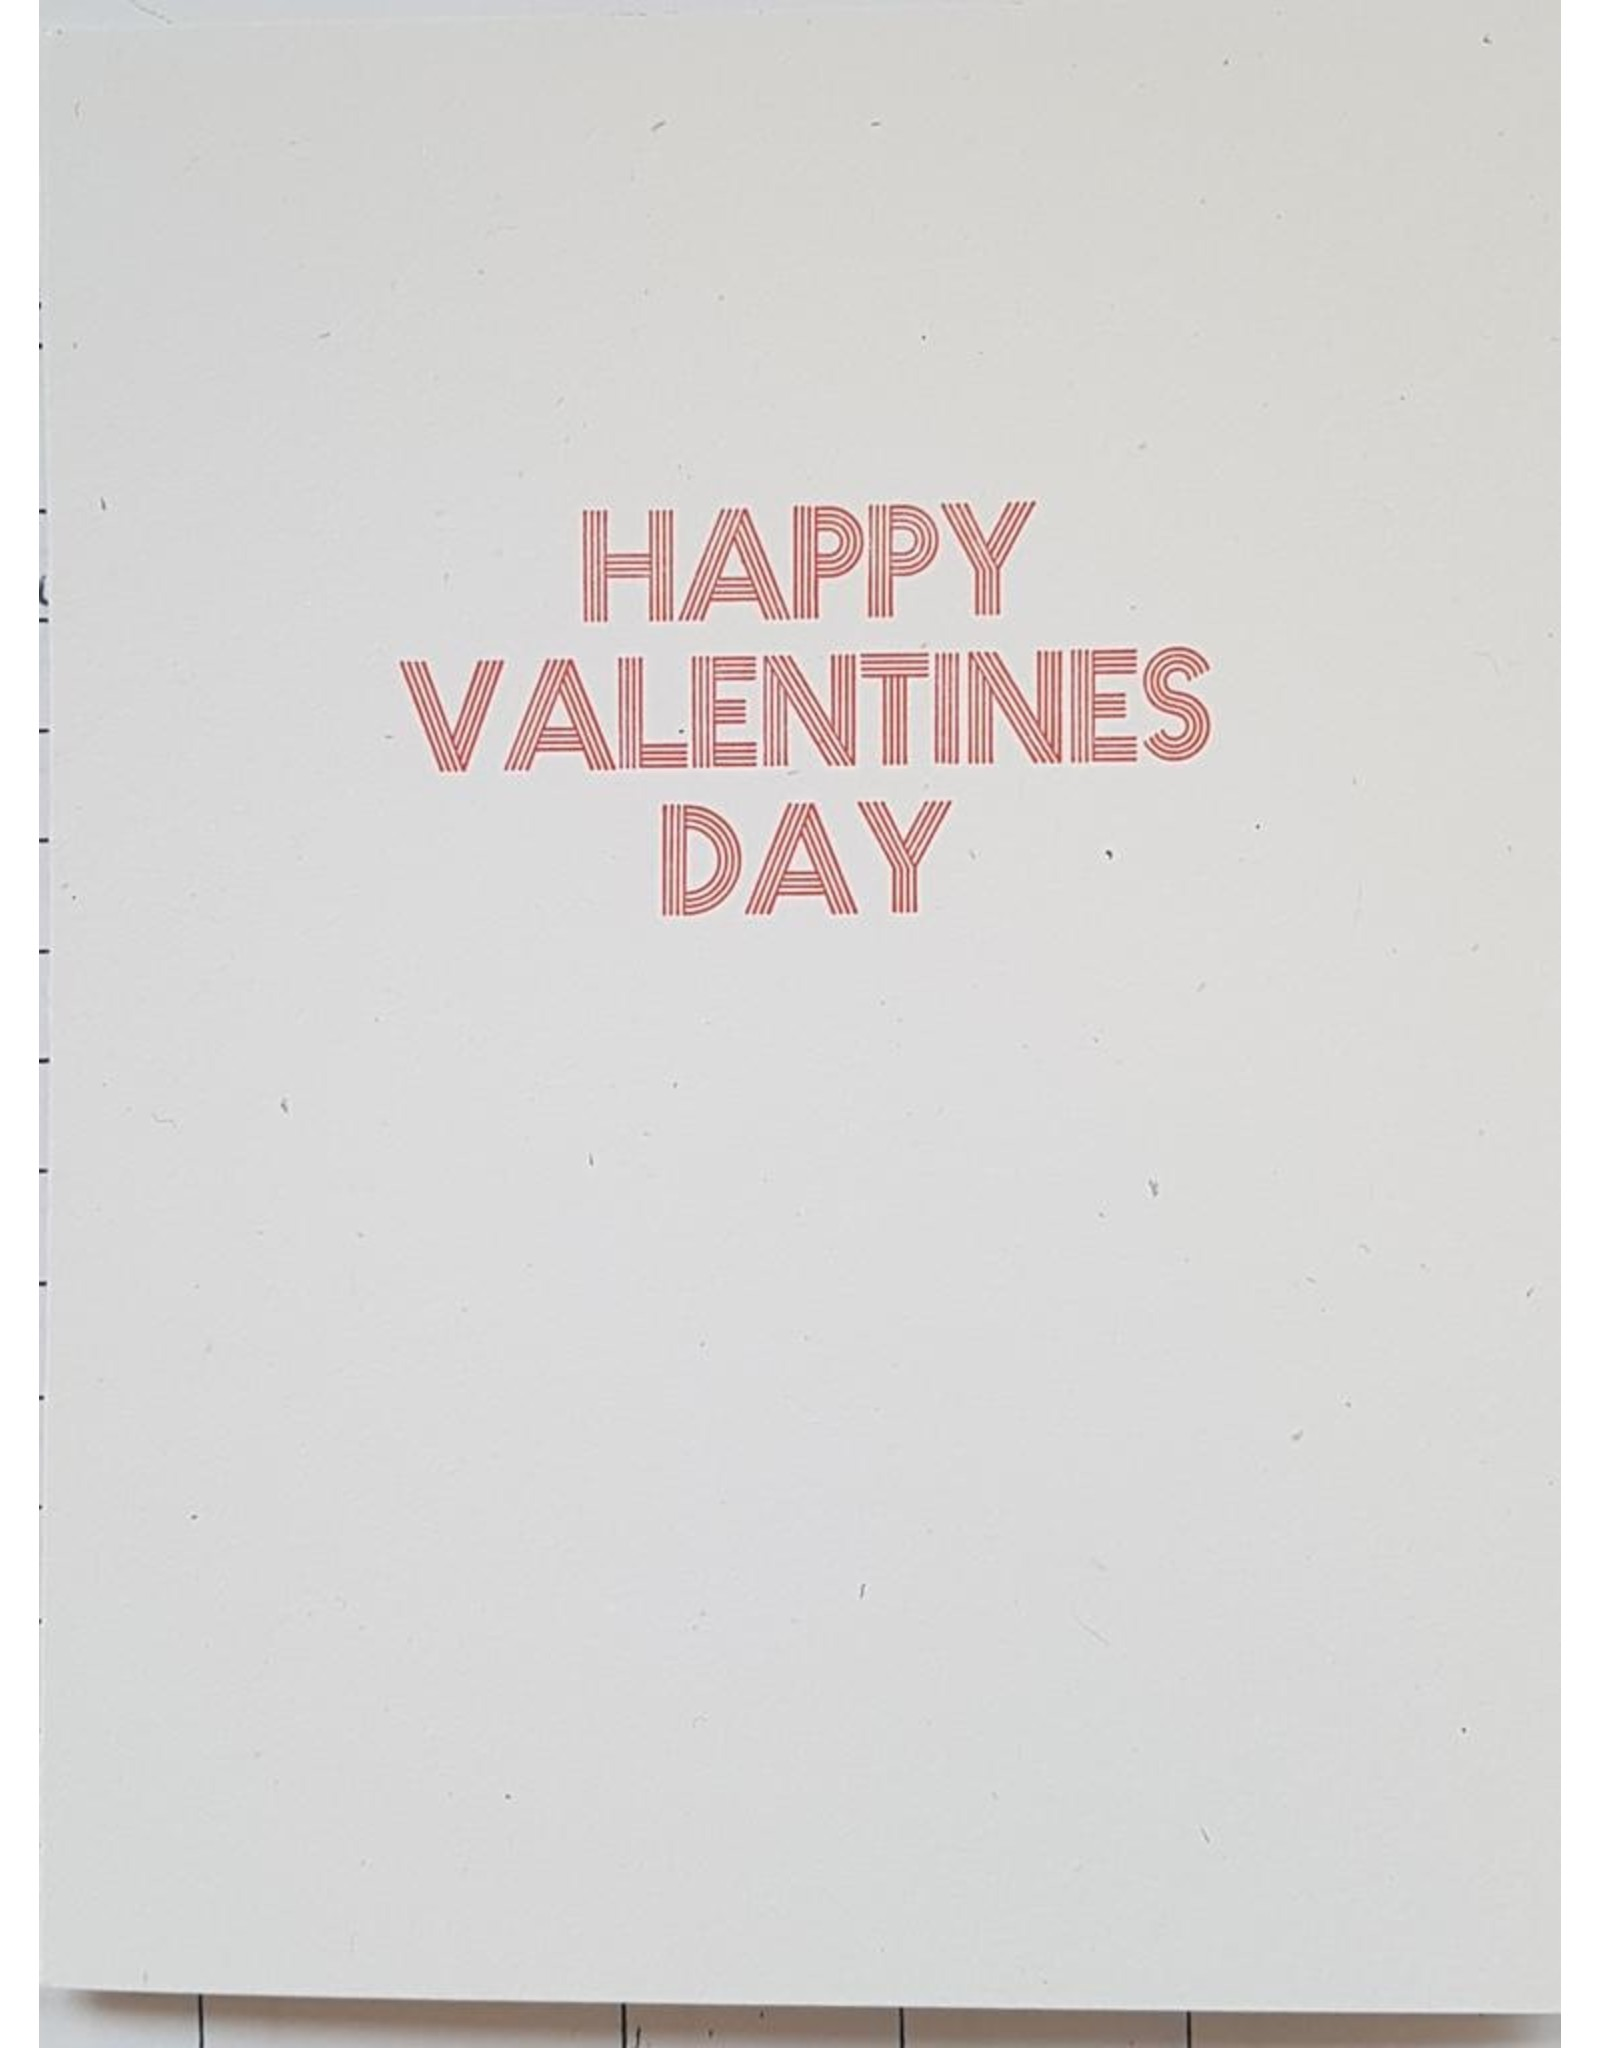 McLachlan, Sean Happy Valentine's Day card, by Printmonger Press